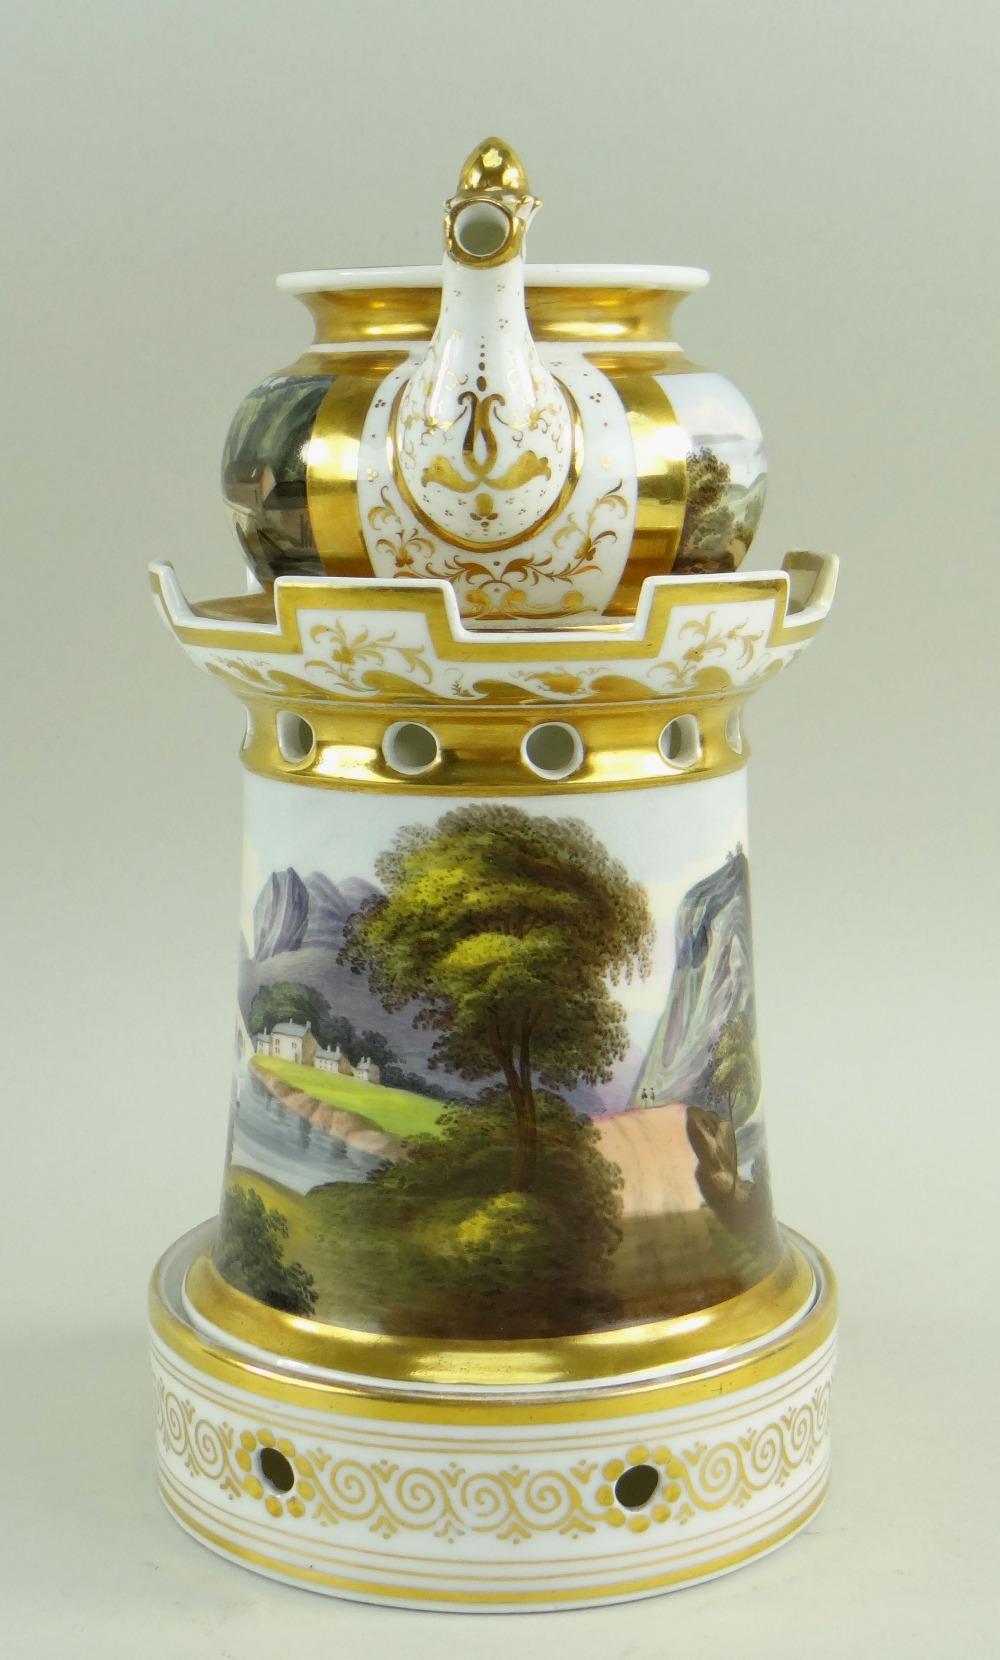 A WELSH LANDSCAPE ENGLISH PORCELAIN VEILLEUSE (tea-pot and warming stand) comprising miniature - Image 2 of 5